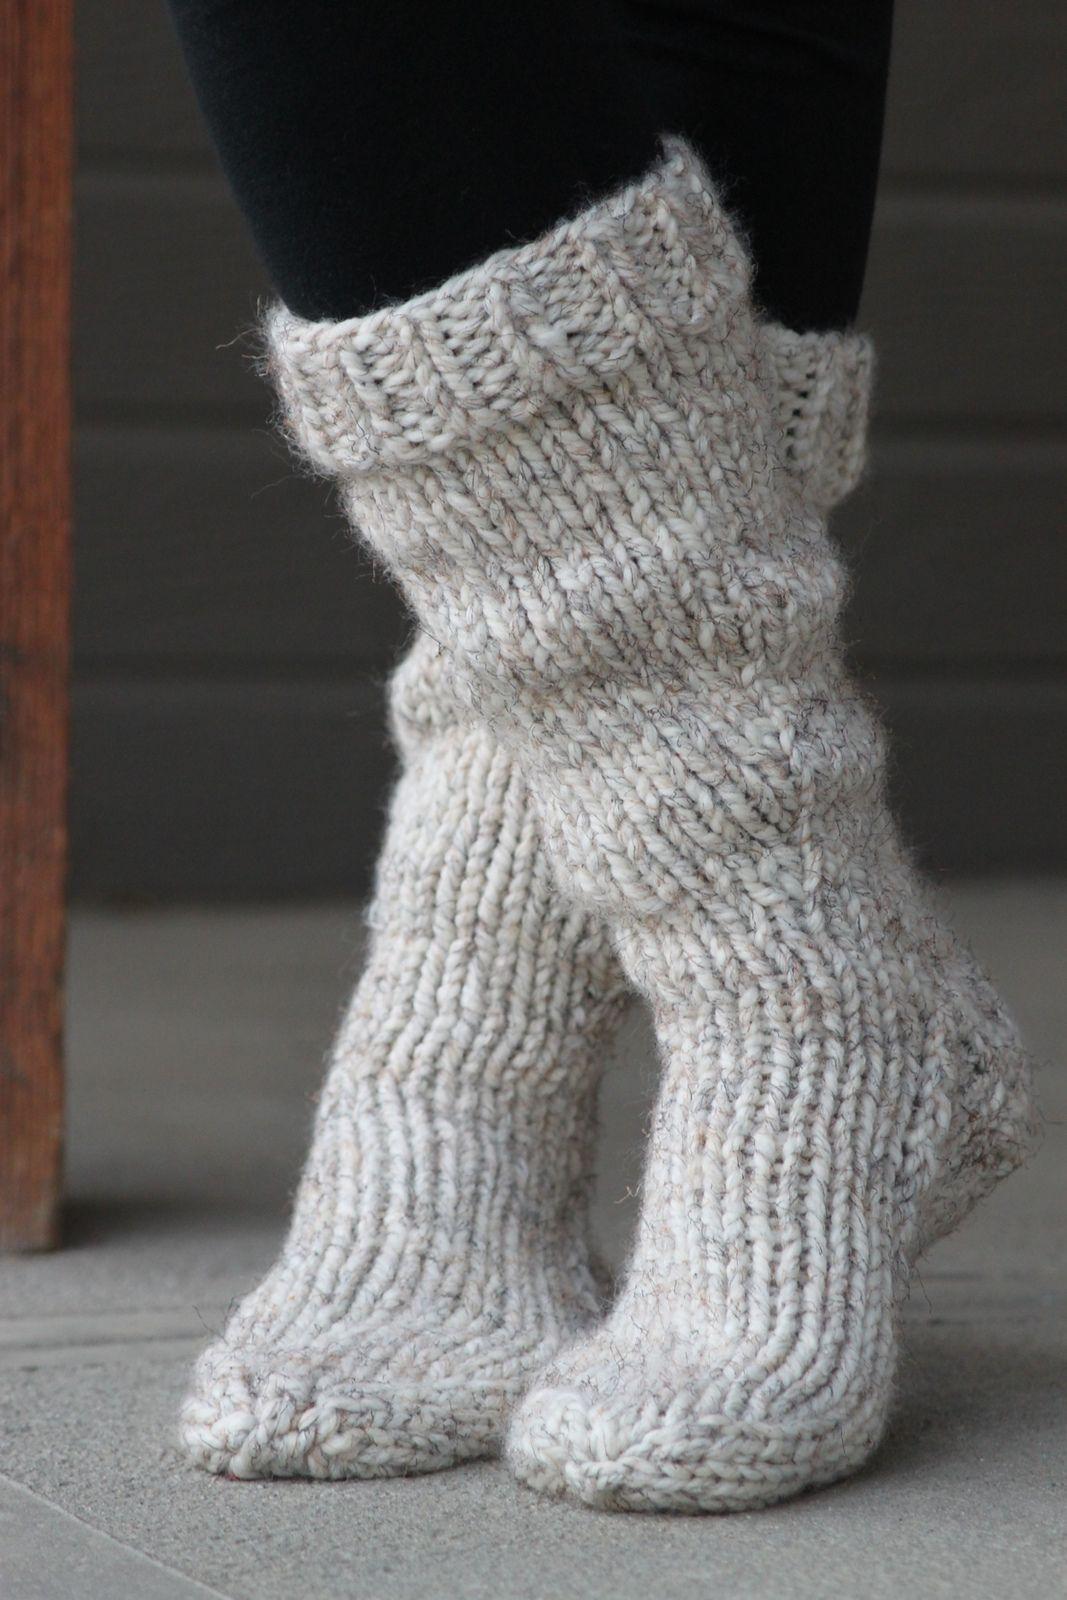 Ravelry bean4680s chunky boot socks crochetknitting patterns we like knitting chunky boot socks free pattern bankloansurffo Choice Image